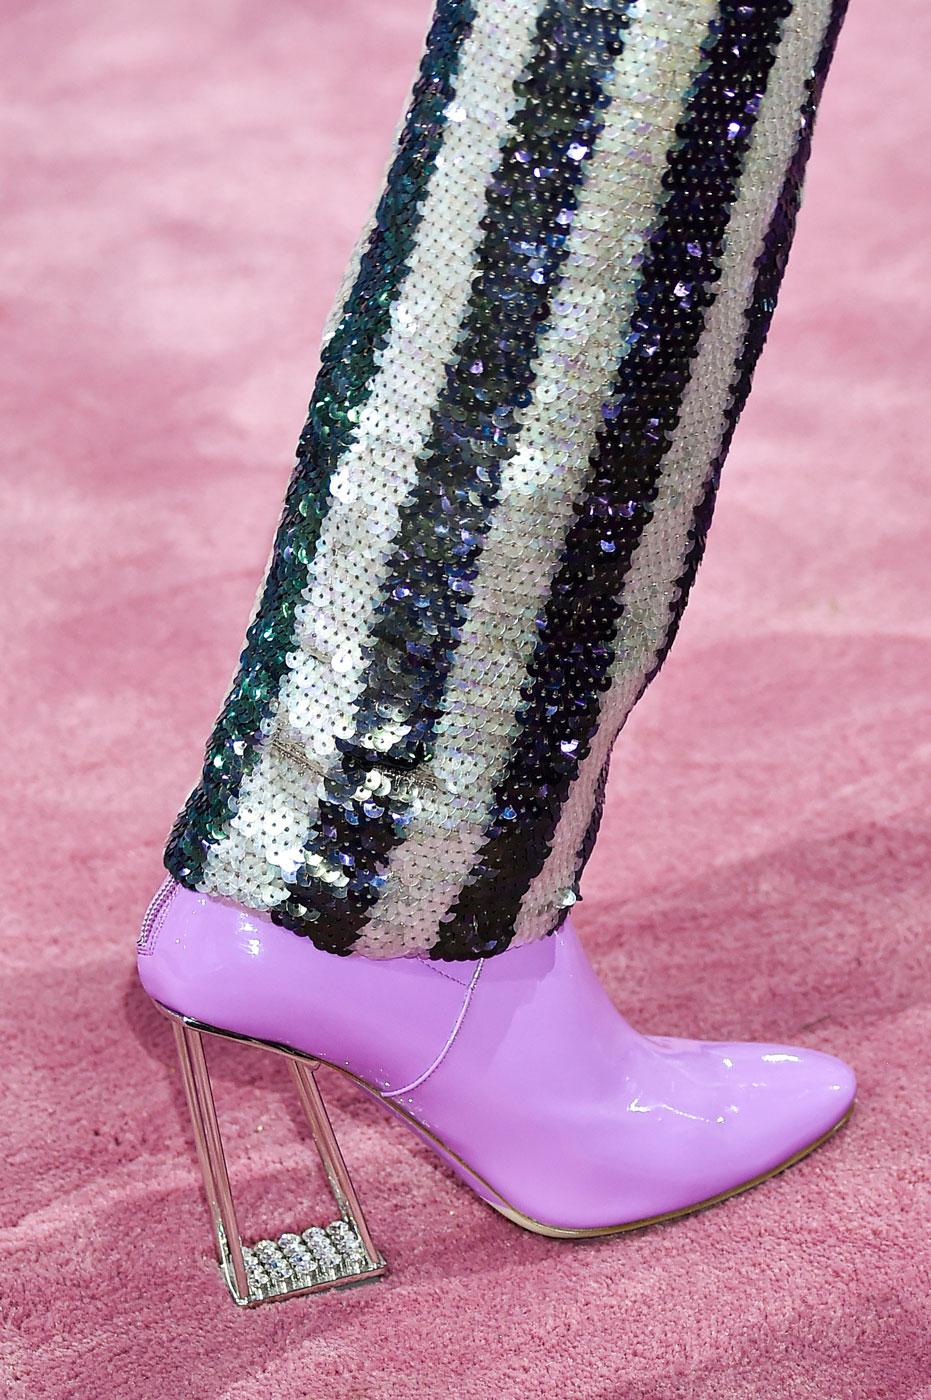 Christian-Dior-fashion-runway-show-close-ups-haute-couture-paris-spring-summer-2015-the-impression-115